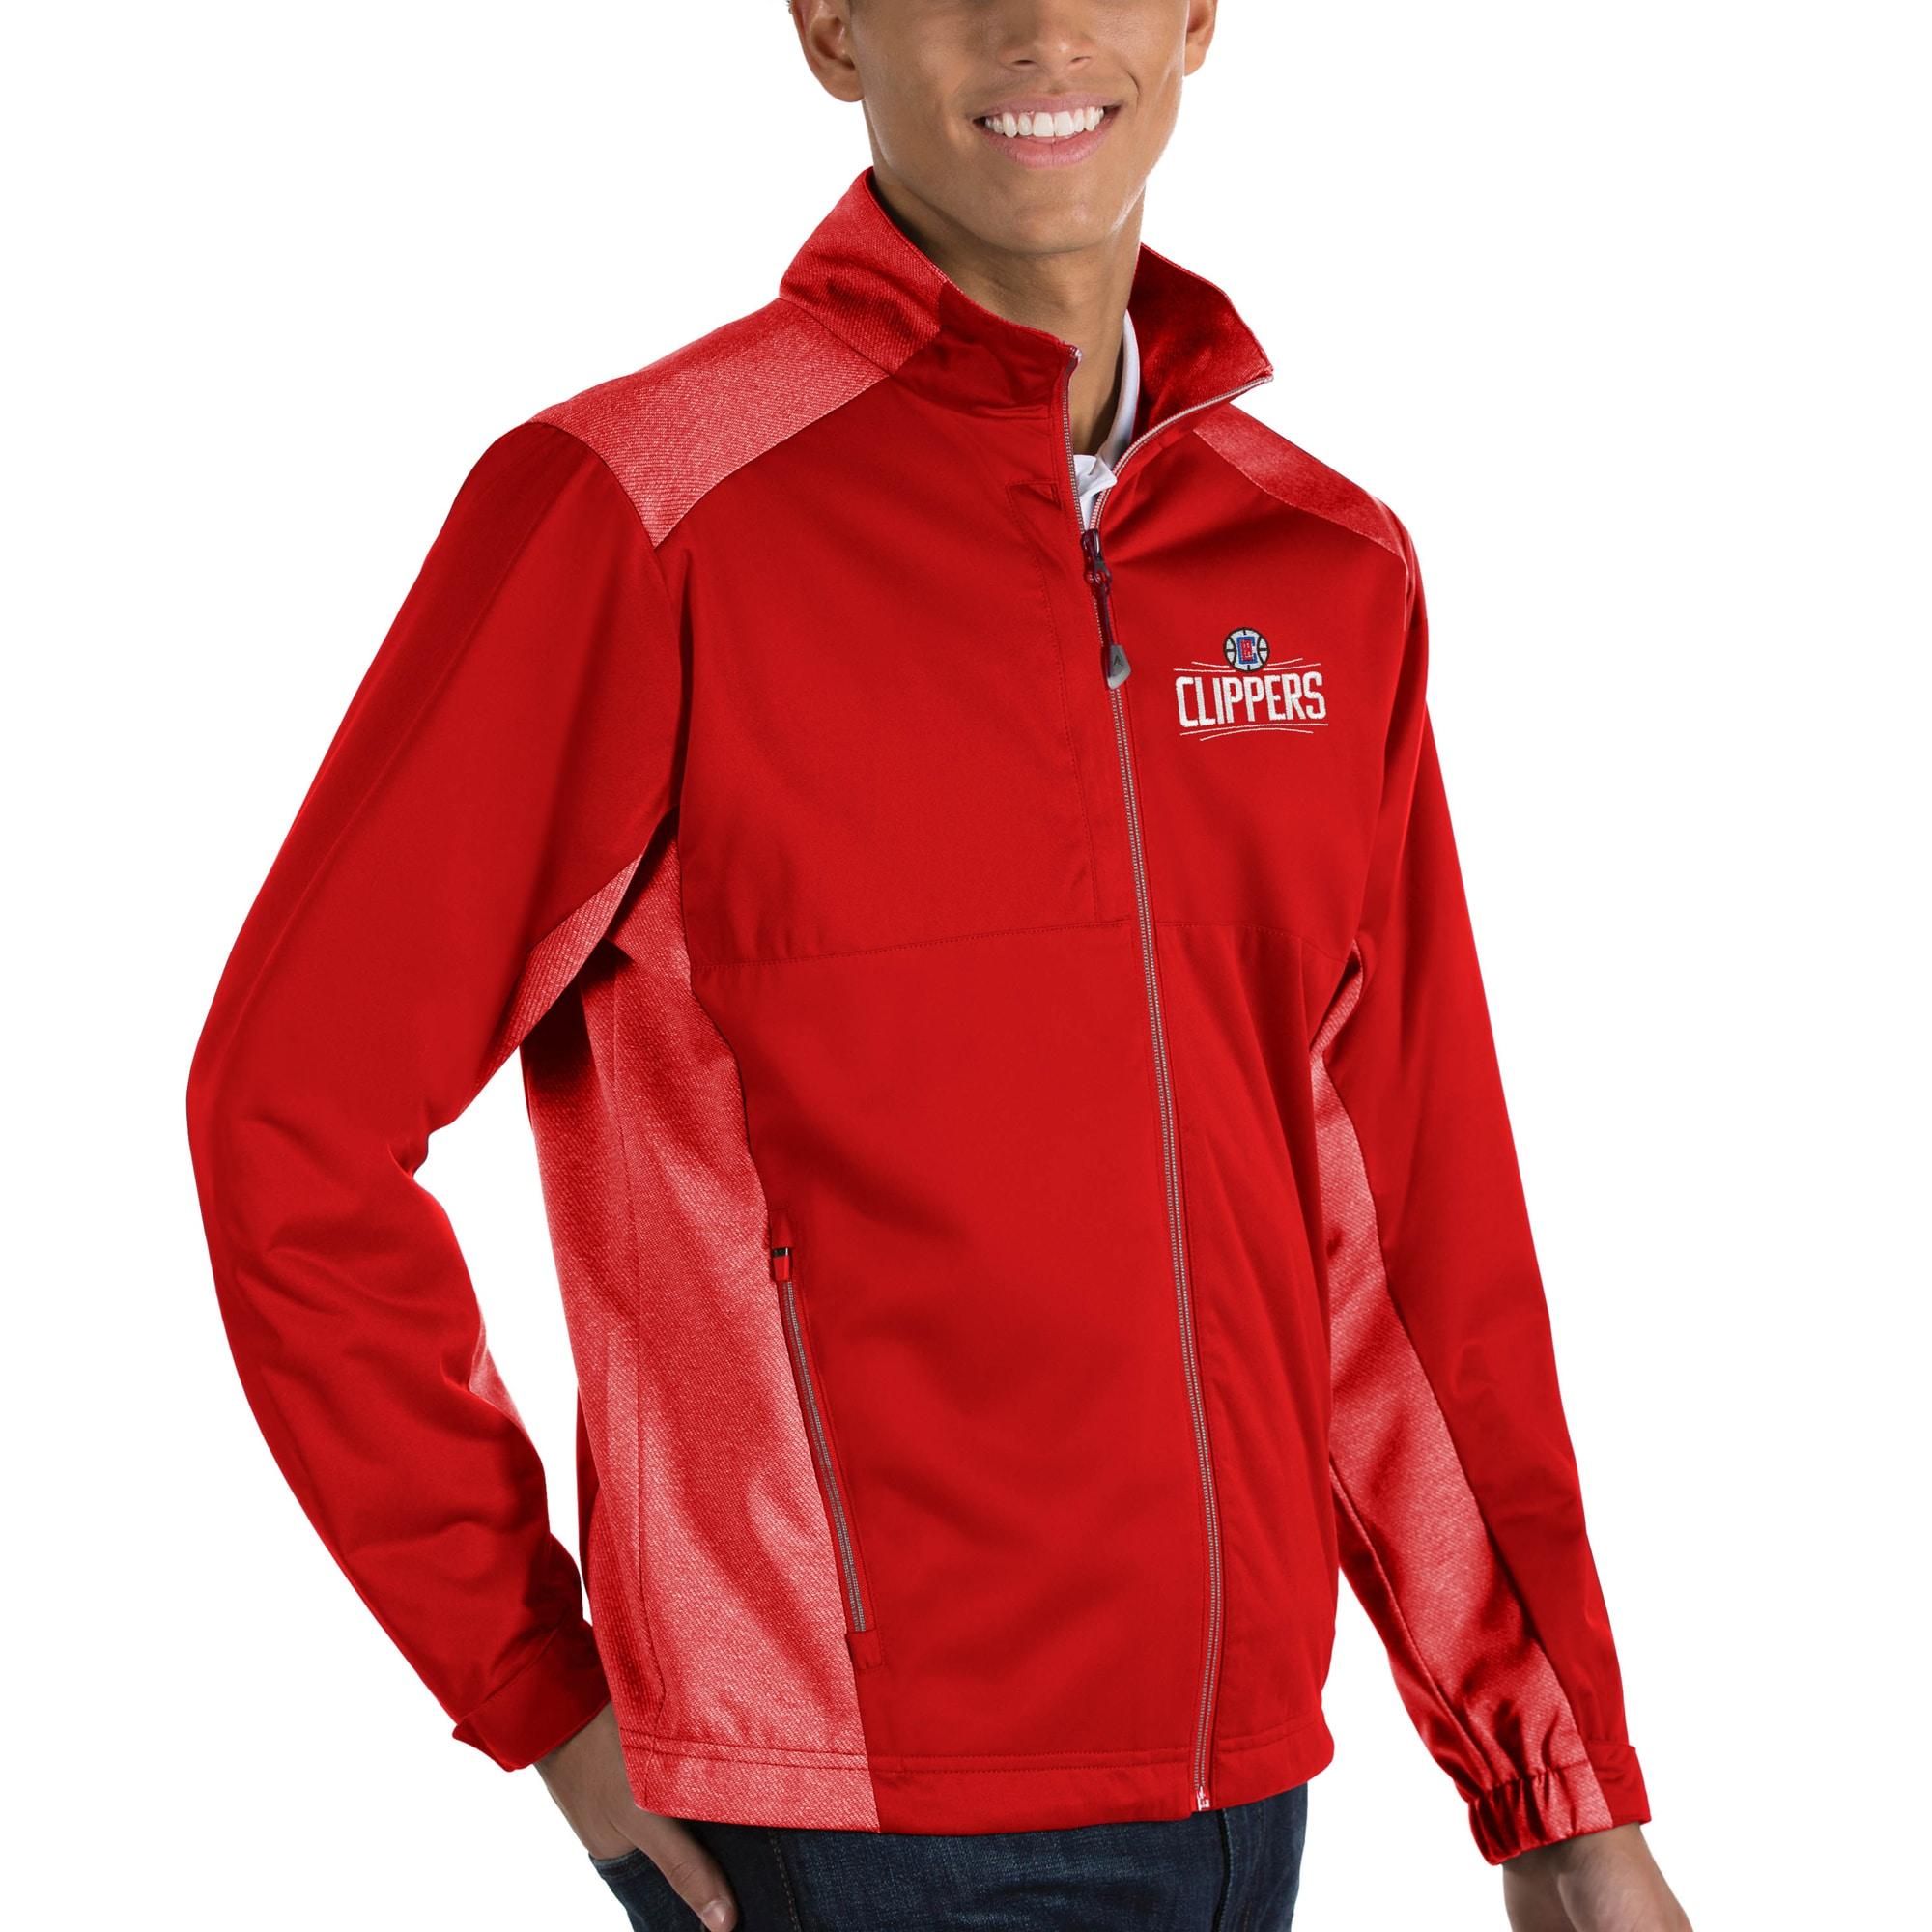 LA Clippers Antigua Revolve Full-Zip Jacket - Red